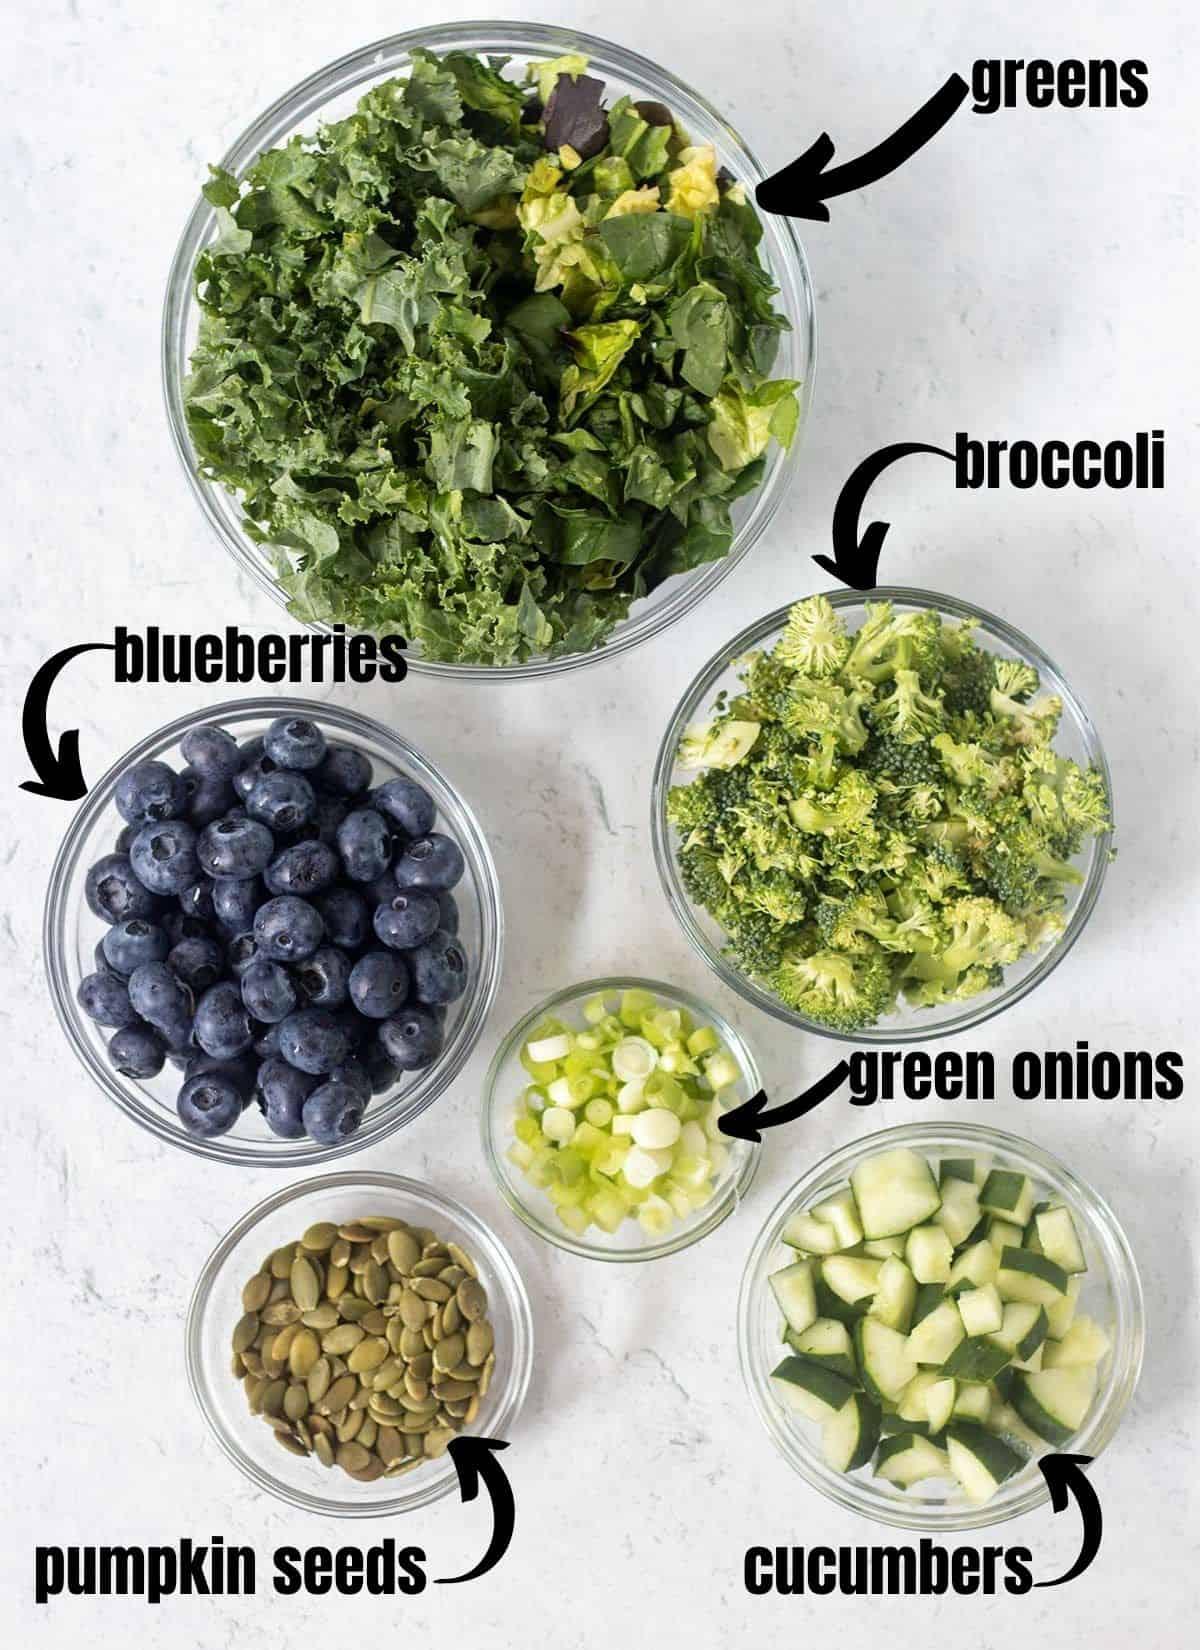 salad greens, broccoli, blueberries, green onions, pumpkin seeds, cucumbers.